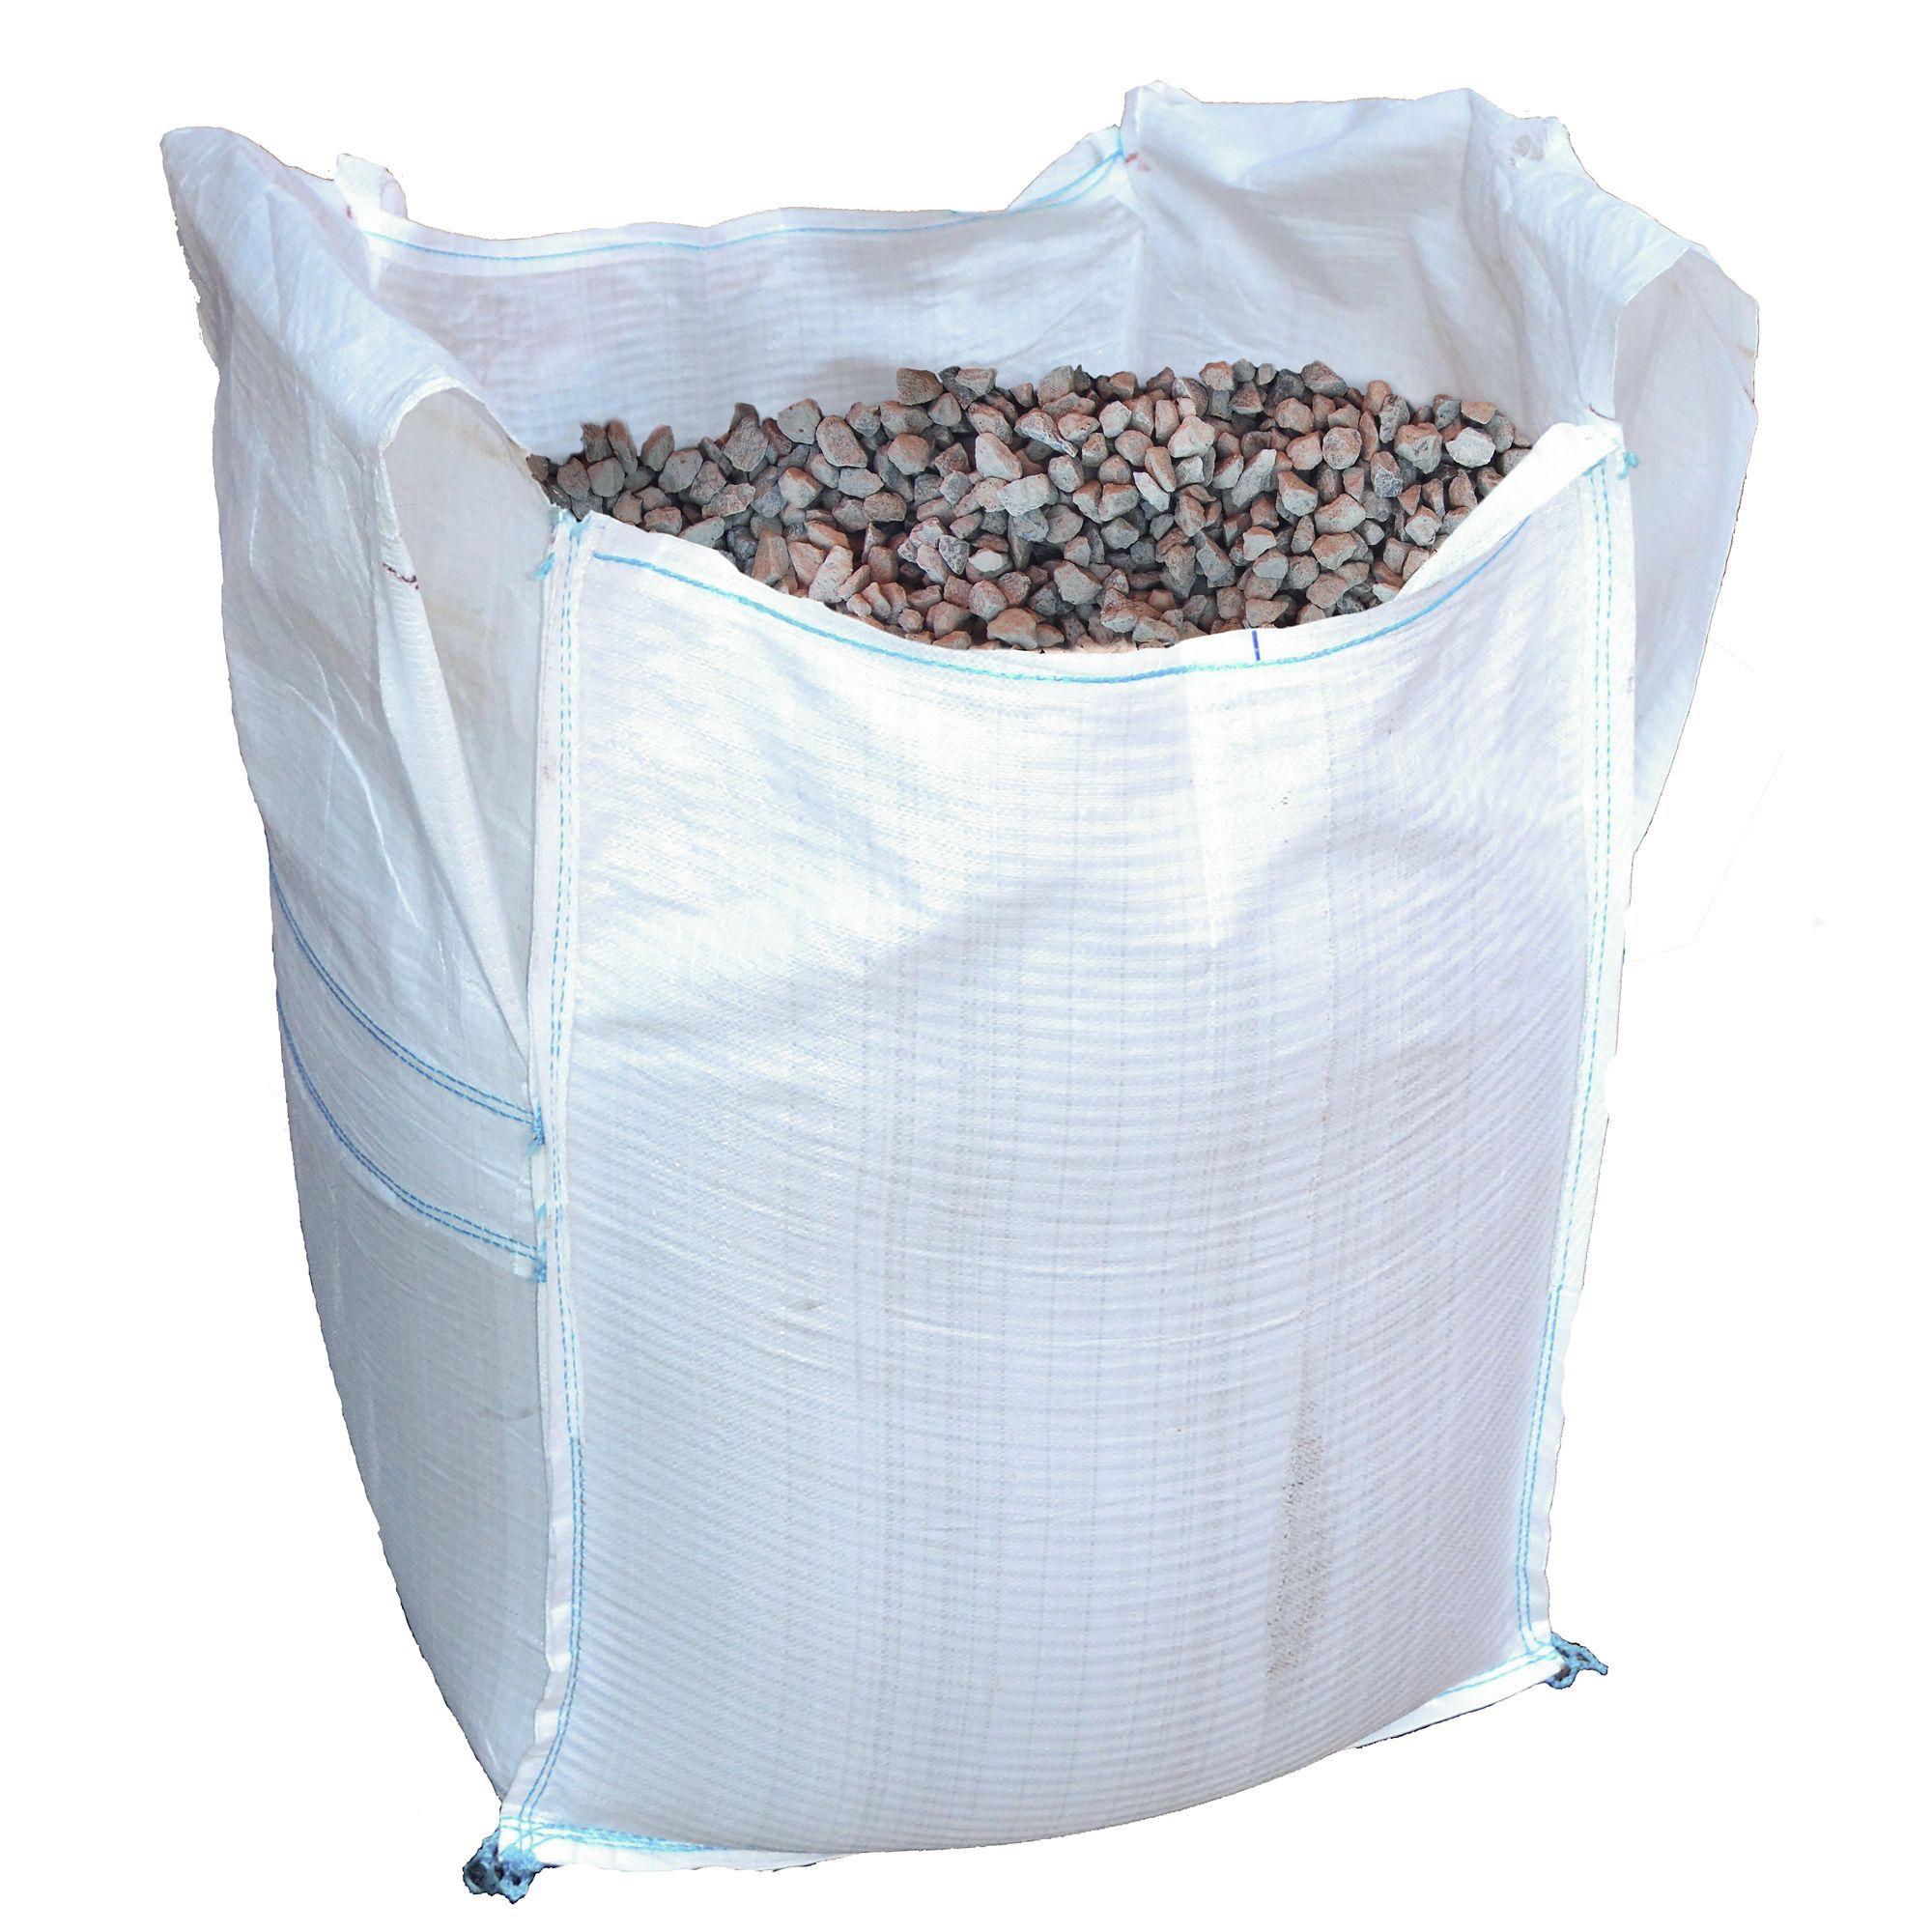 Cool 20Mm Limestone Chippings Bulk Bag Departments Diy At Bq Short Links Chair Design For Home Short Linksinfo